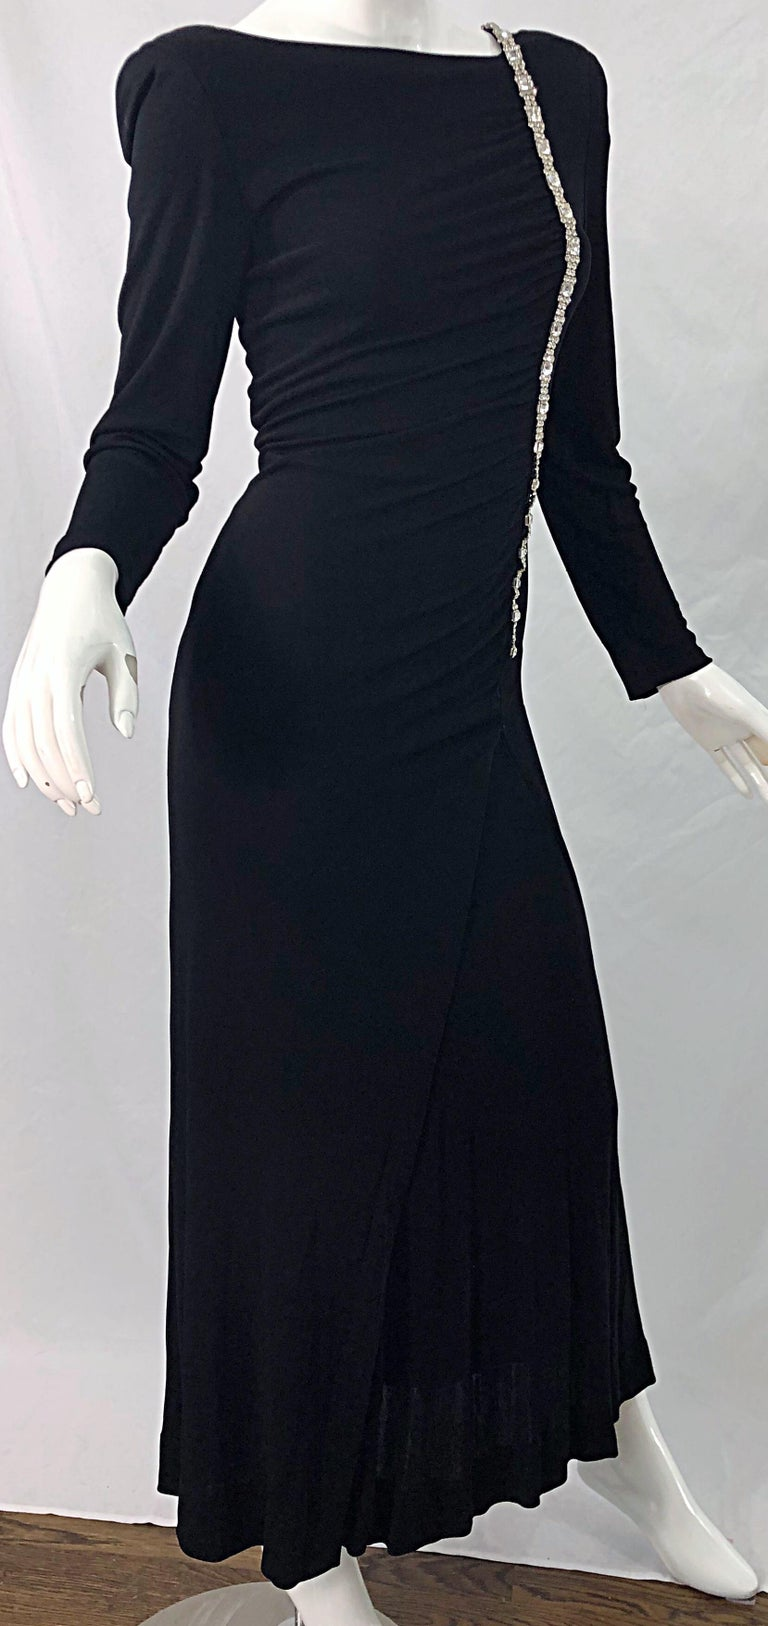 1980s Travilla Size 10 Black Matte Silk Jersey Rhinestone Vintage 80s Gown Dress For Sale 2